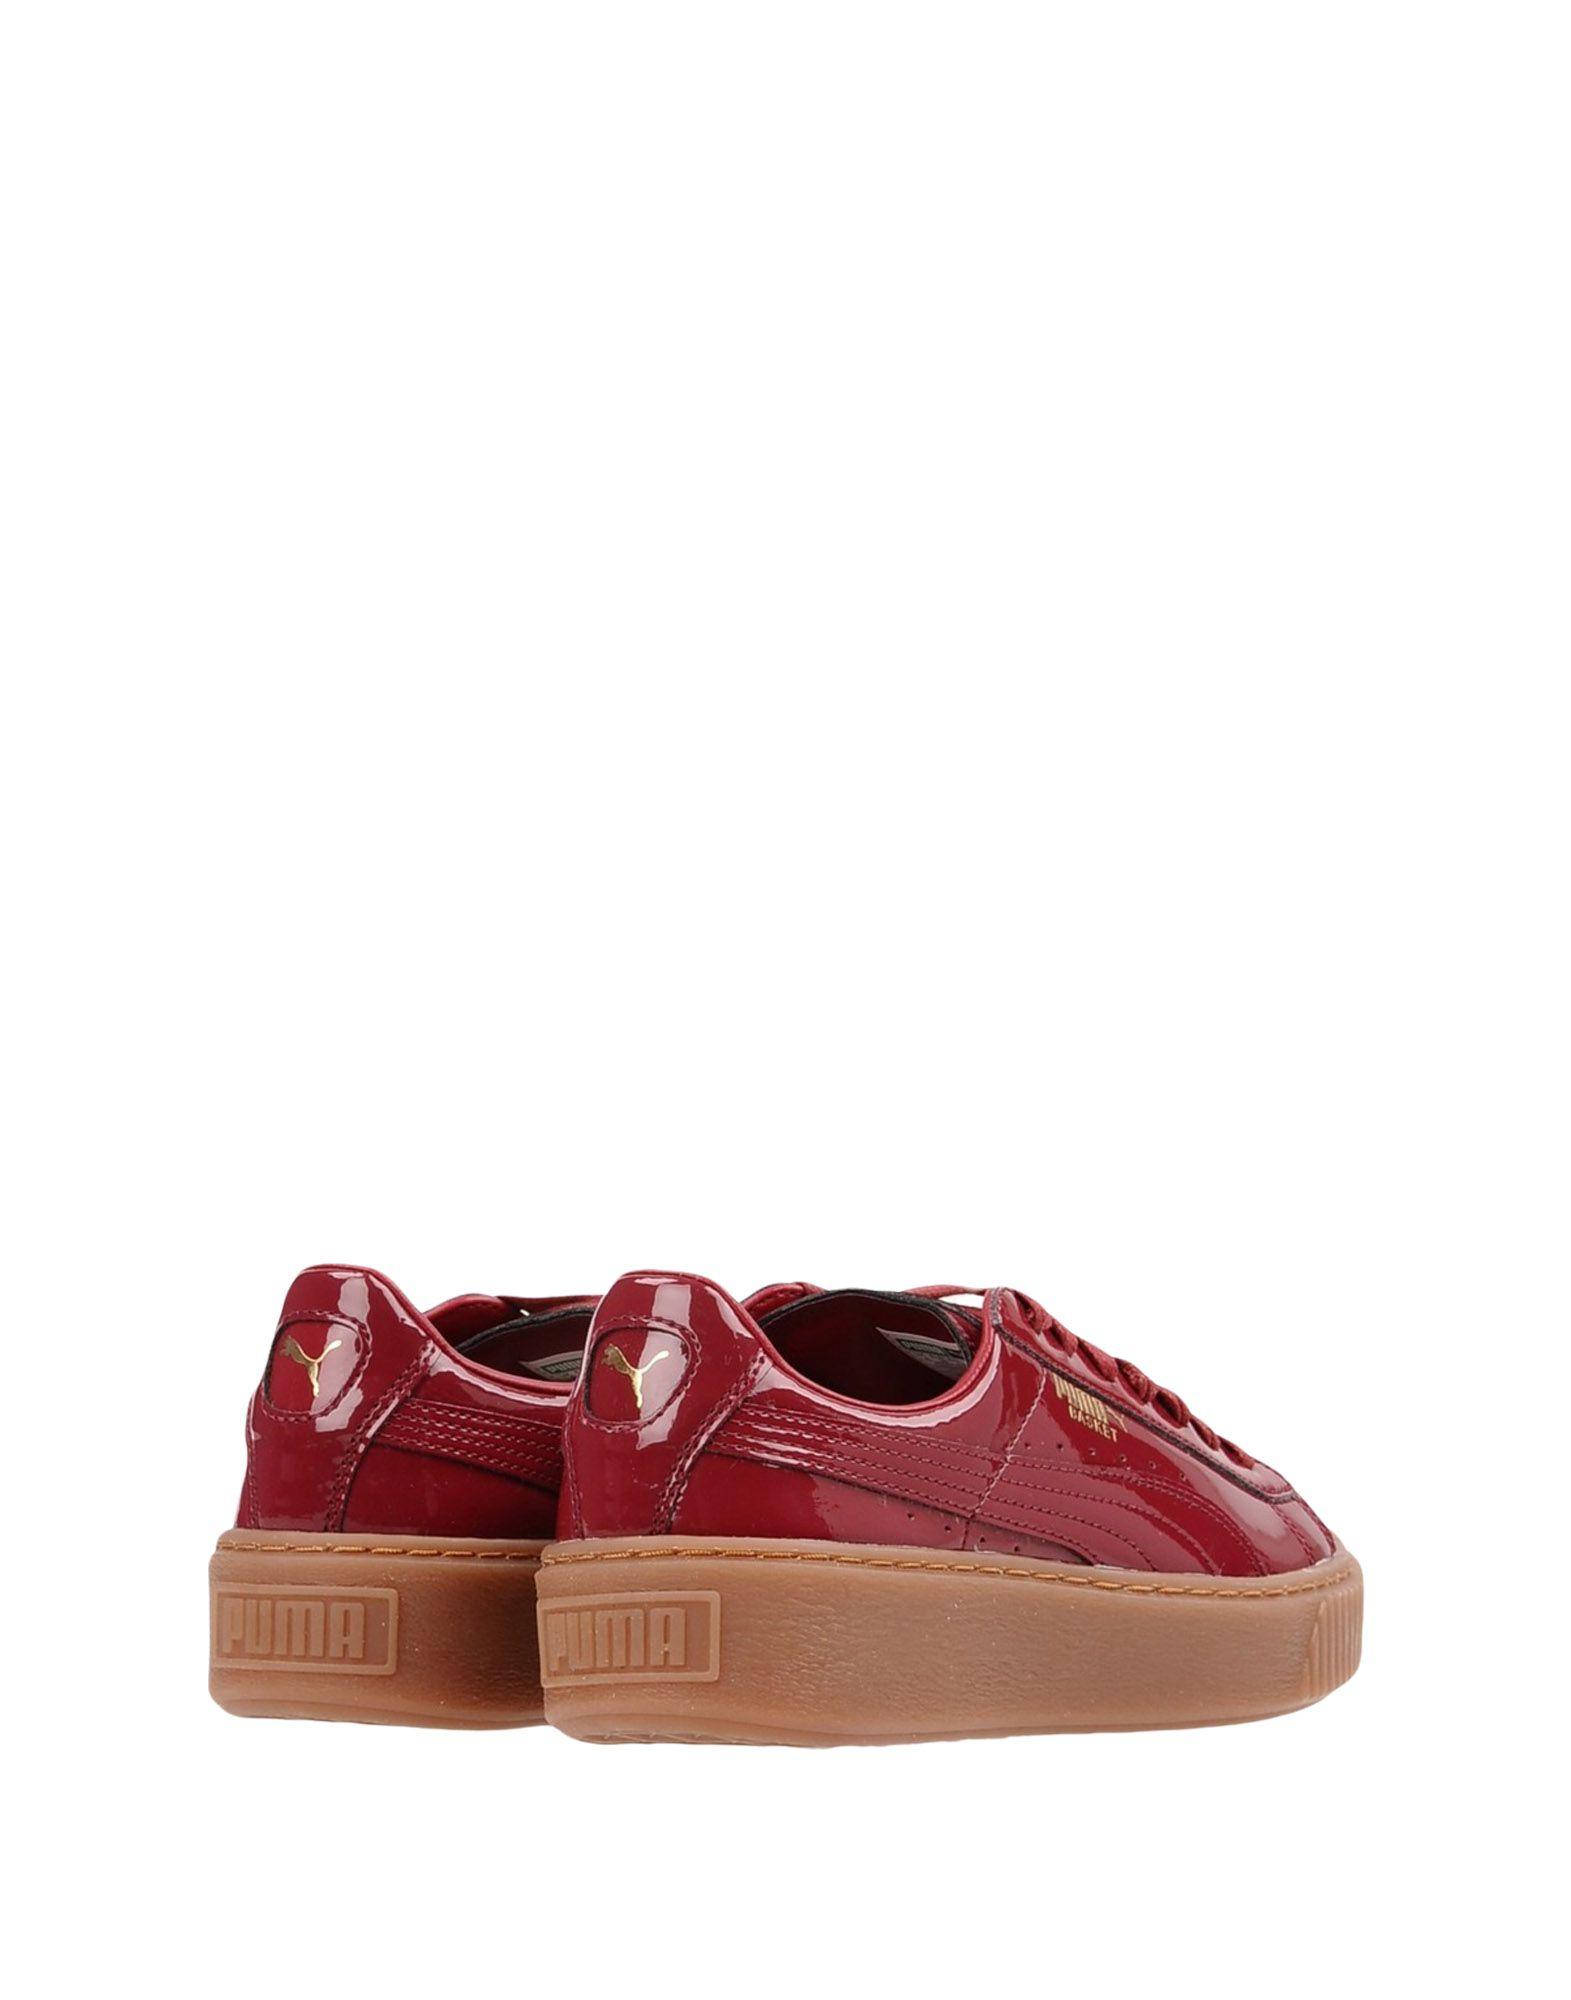 Puma Basket Platform Patent Wn's - Sneakers - Women Puma Canada Sneakers online on  Canada Puma - 11380974GE ba44e3